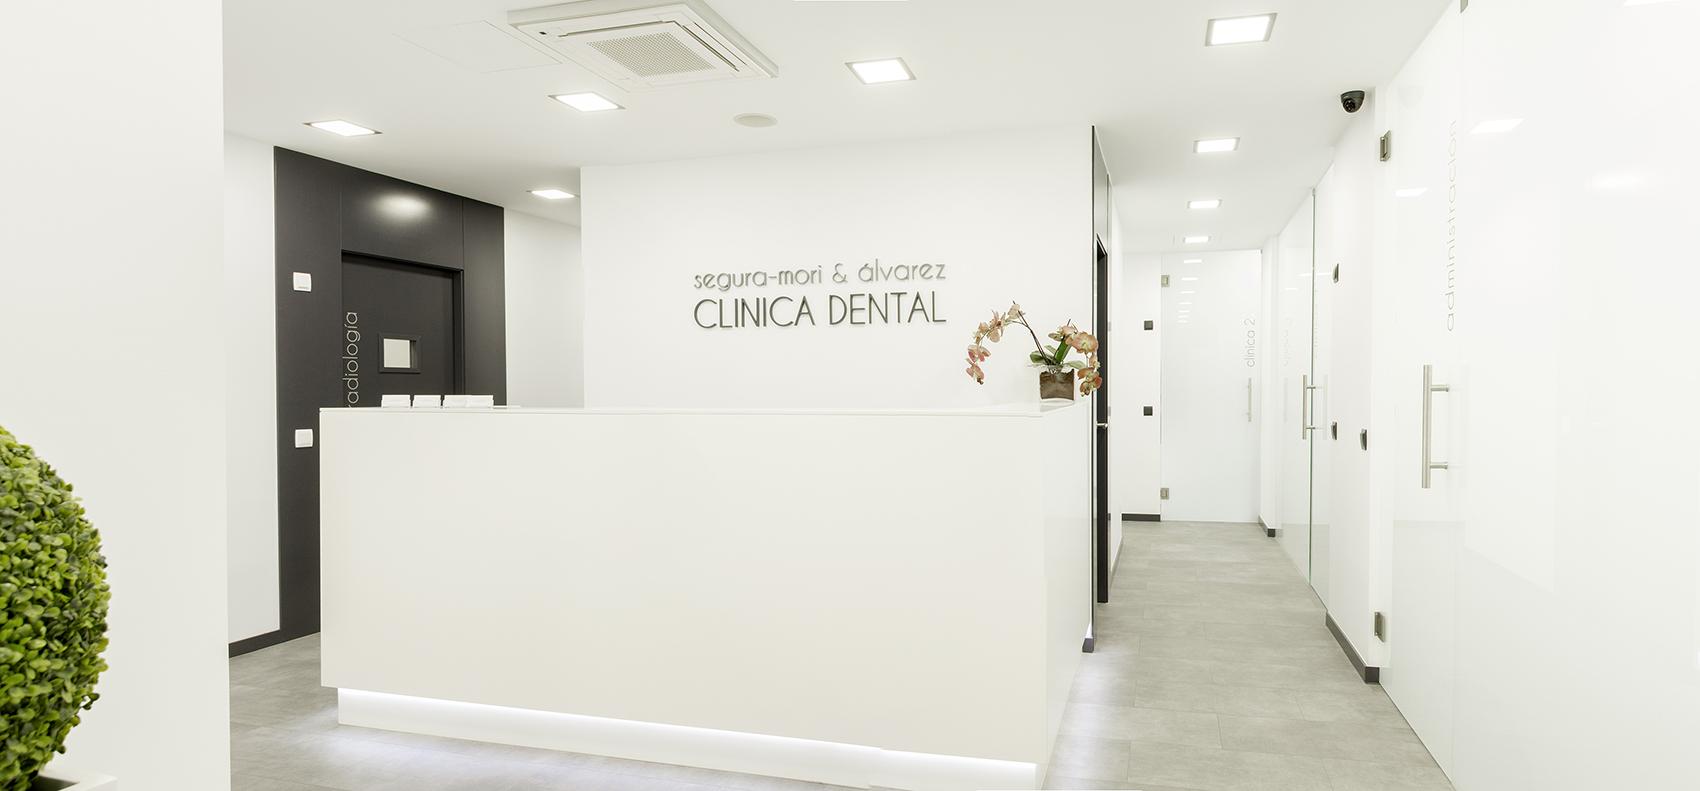 Clinica Segura-Mori & Álvarez